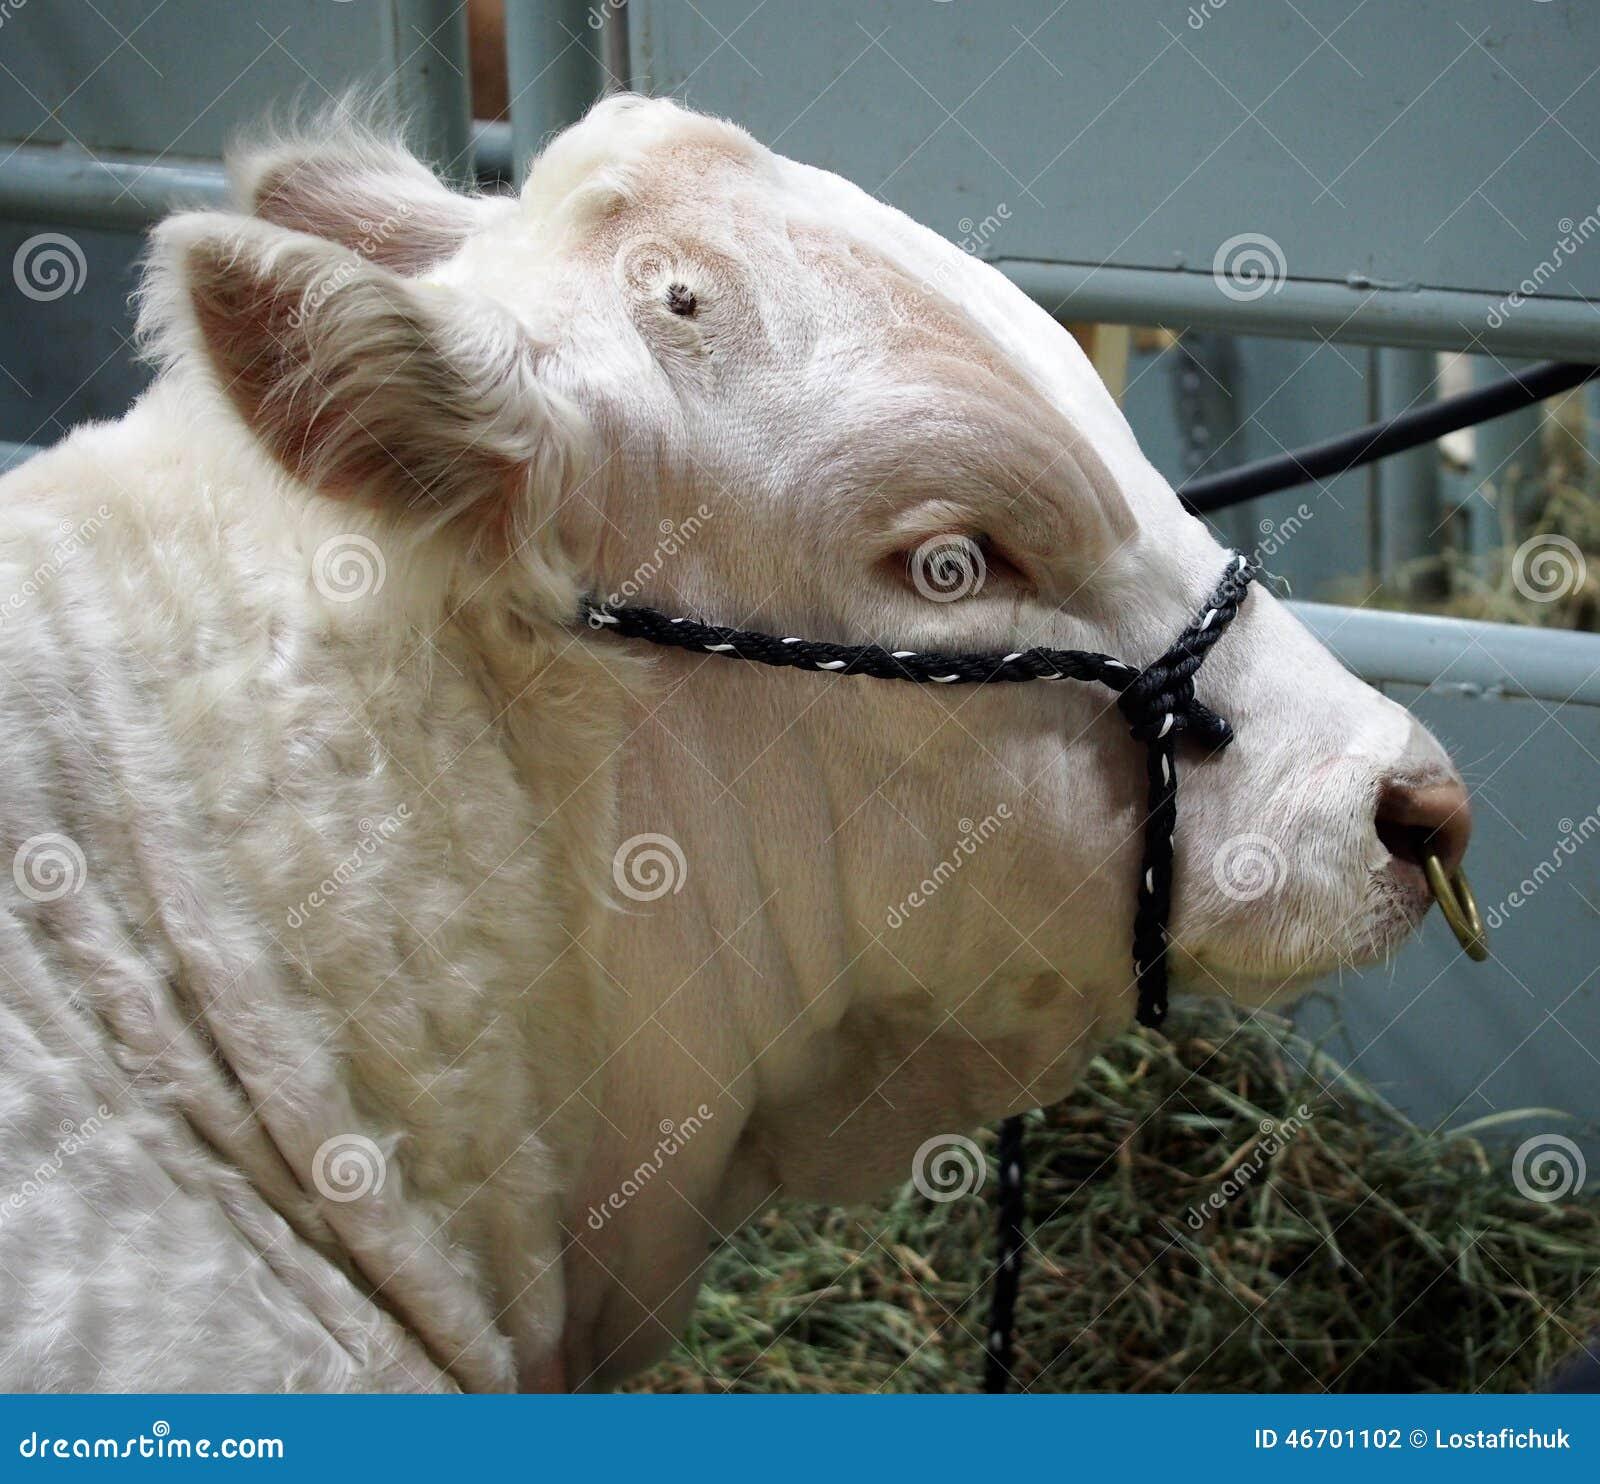 Portrait Of Charolais Bull Stock Photo Image Of Nose 46701102